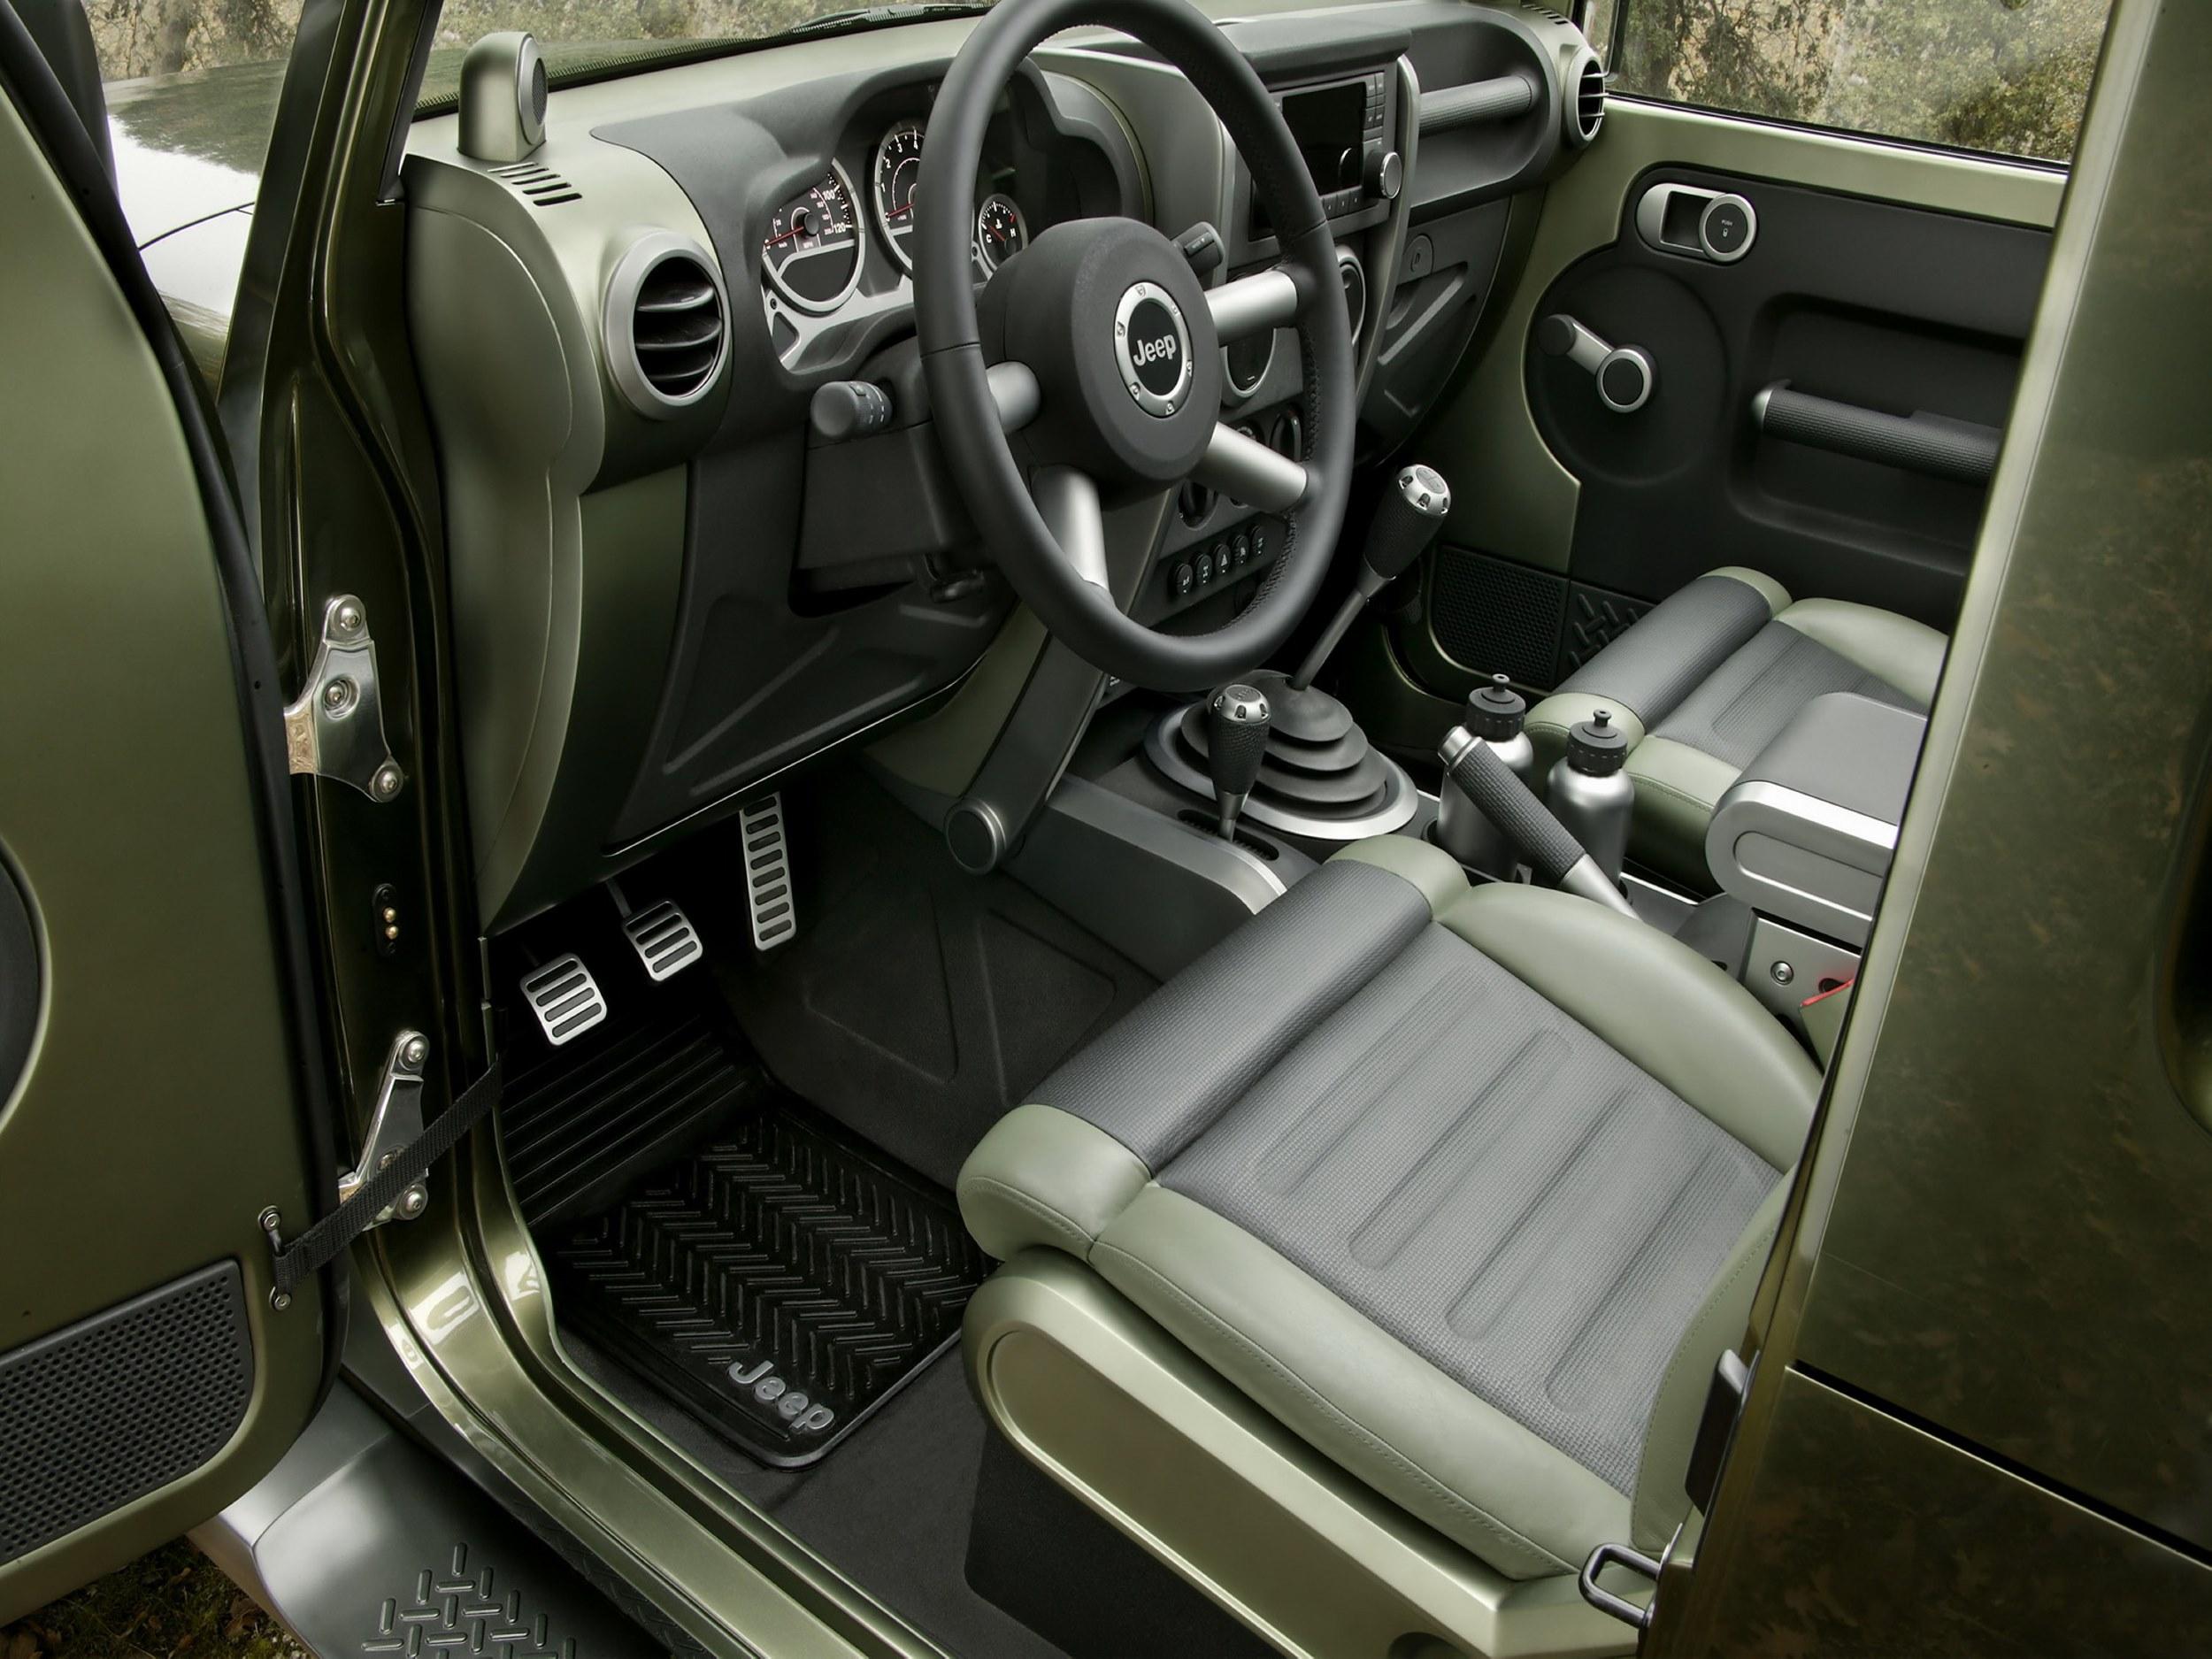 autowp.ru jeep gladiator concept 6.jpg jeep gladiator concept 6